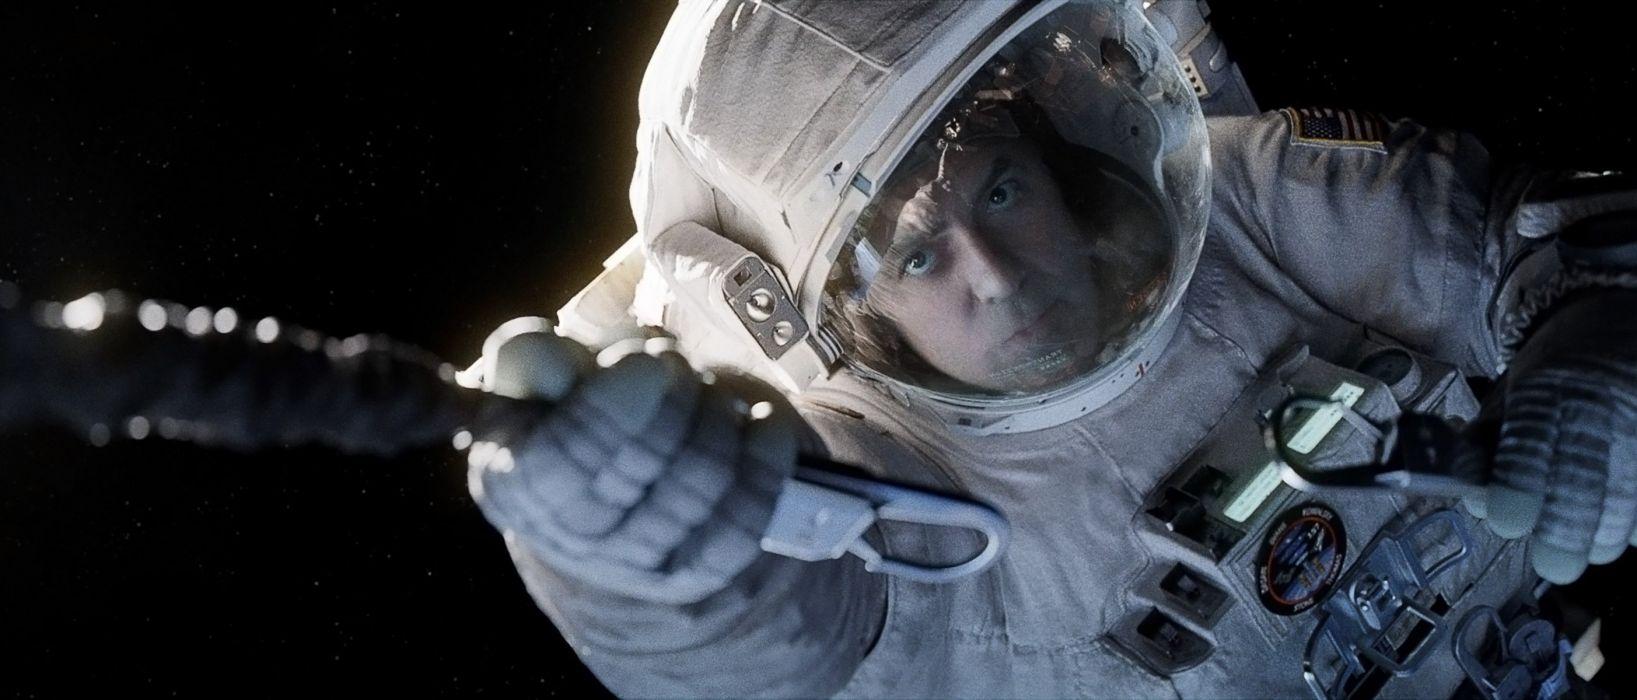 GRAVITY drama sci-fi thriller space astronaut   te wallpaper